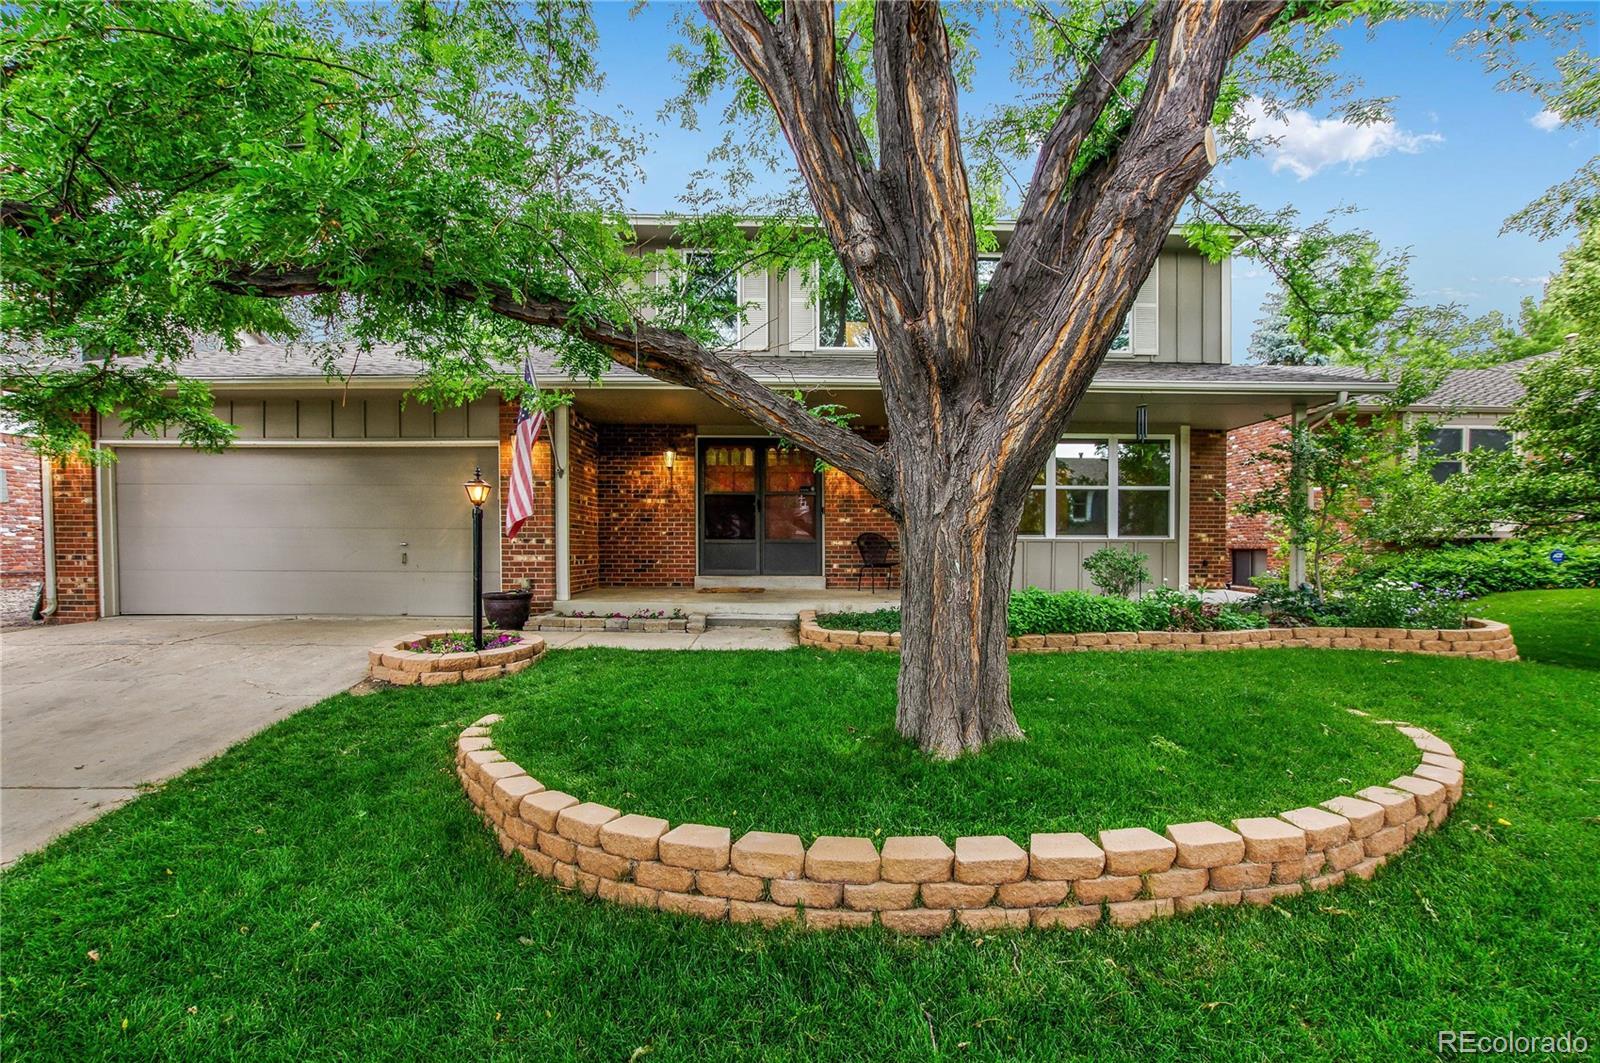 7887 S Magnolia Way Property Photo - Centennial, CO real estate listing